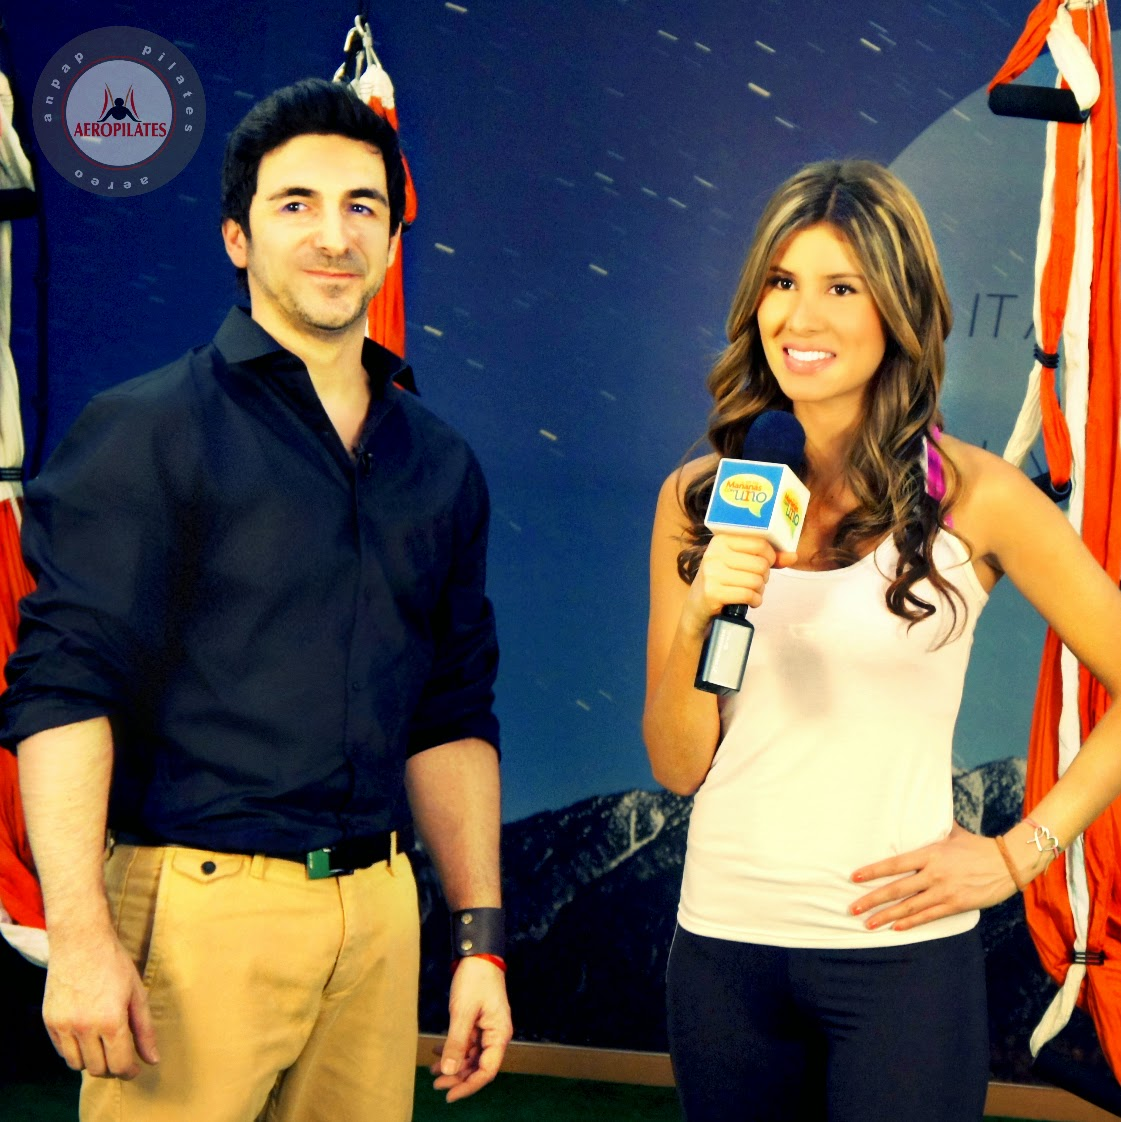 RAFAEL MARTINEZ: AERIAL YOGA TV PRESS HEALTH BEAUTY WELLNESS, AEROYOGA